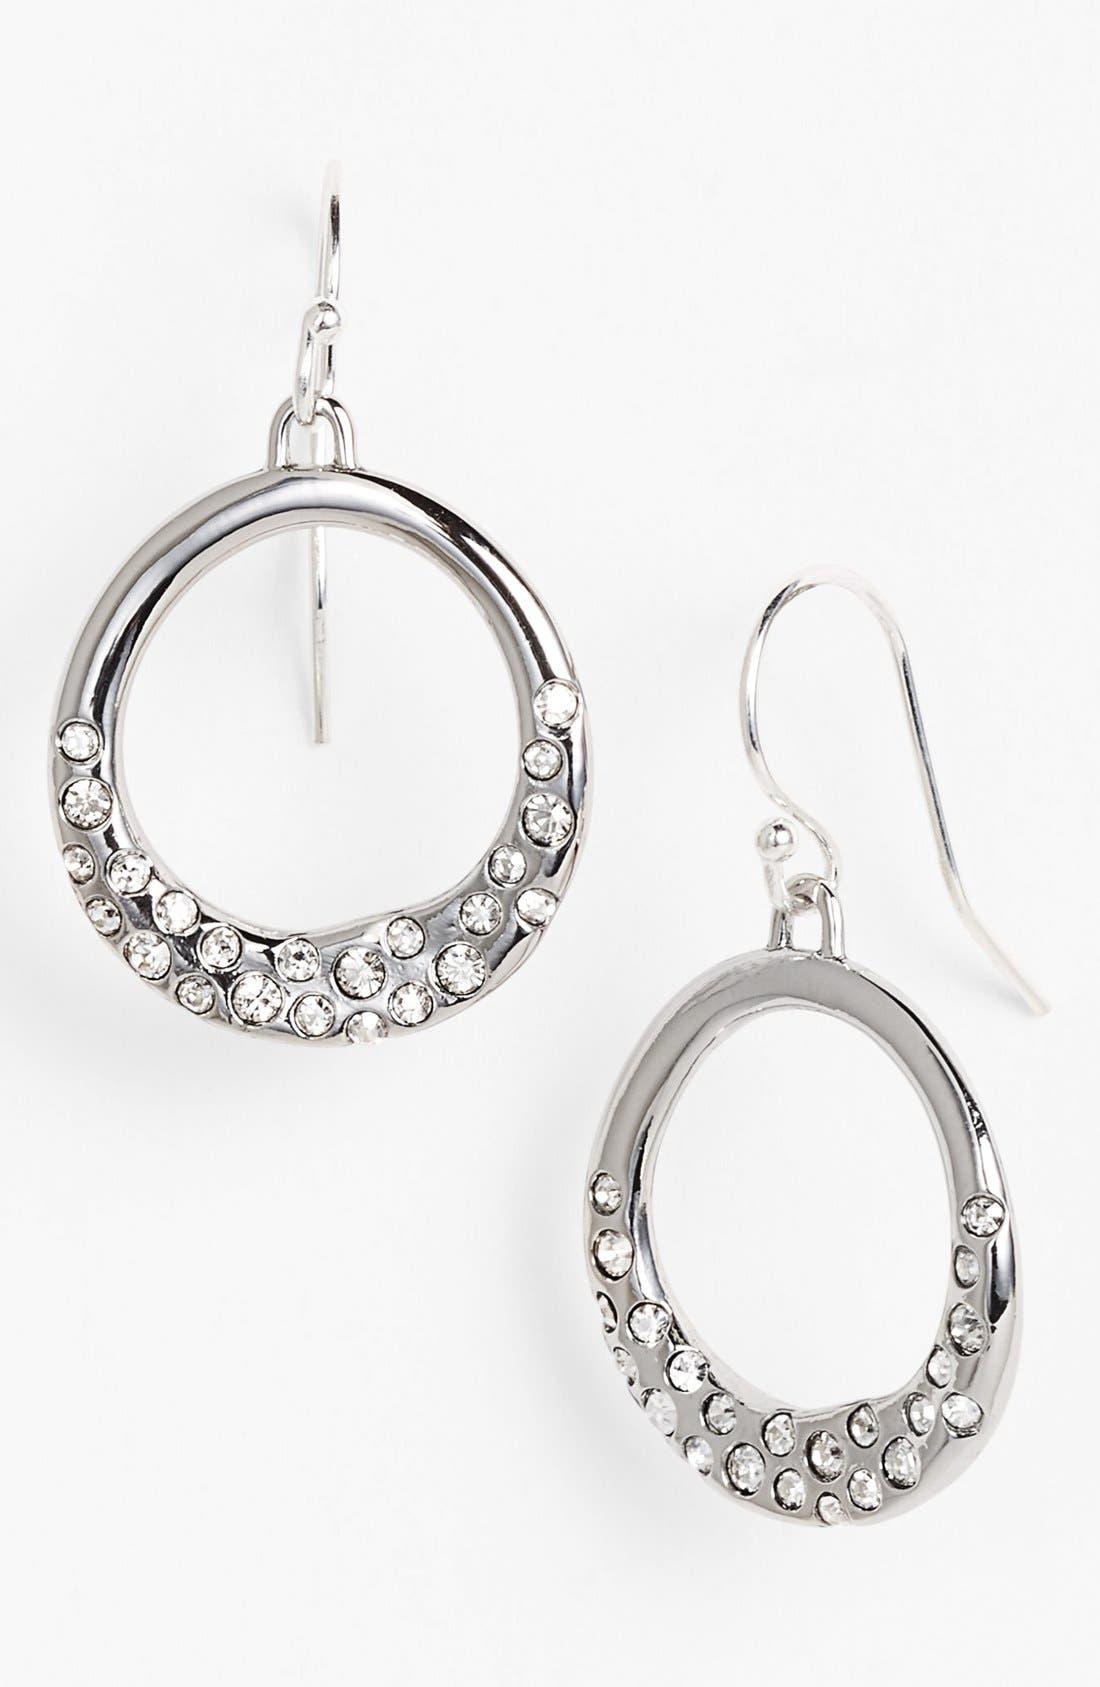 Alternate Image 1 Selected - Alexis Bittar 'Miss Havisham - Liquid' Drop Earrings